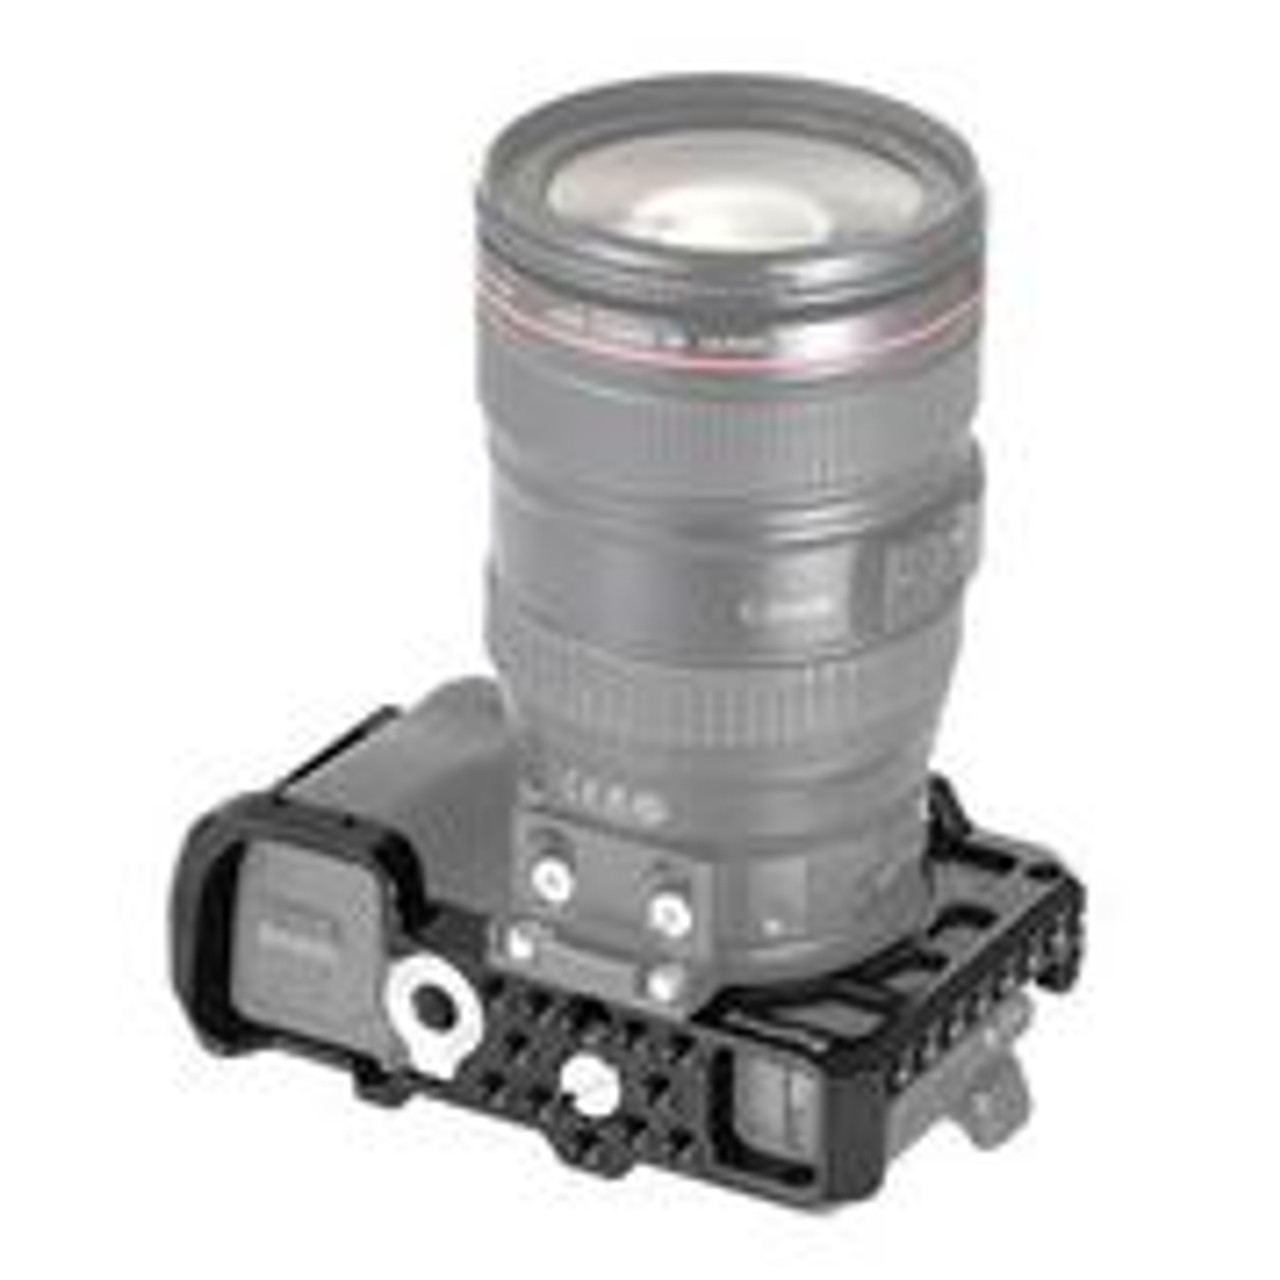 SMALLRIG CAGE - SONY A6100/A6300/A6400/A6500